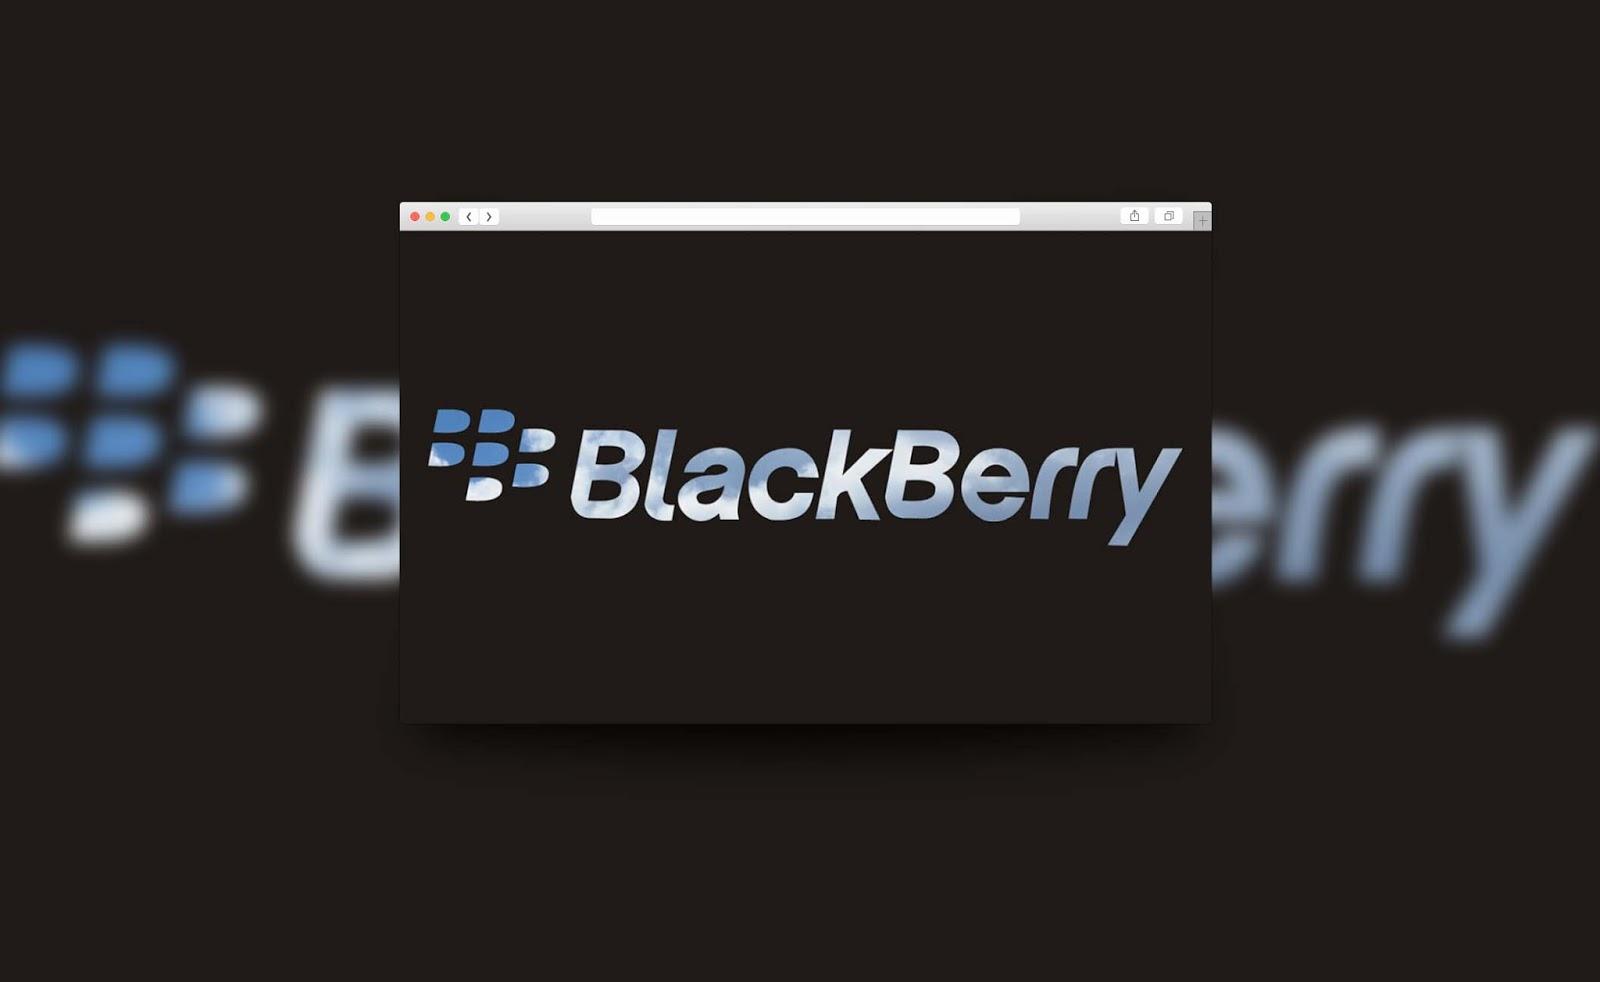 Blackberry Pc Suite - Free downloads ... - download.cnet.com